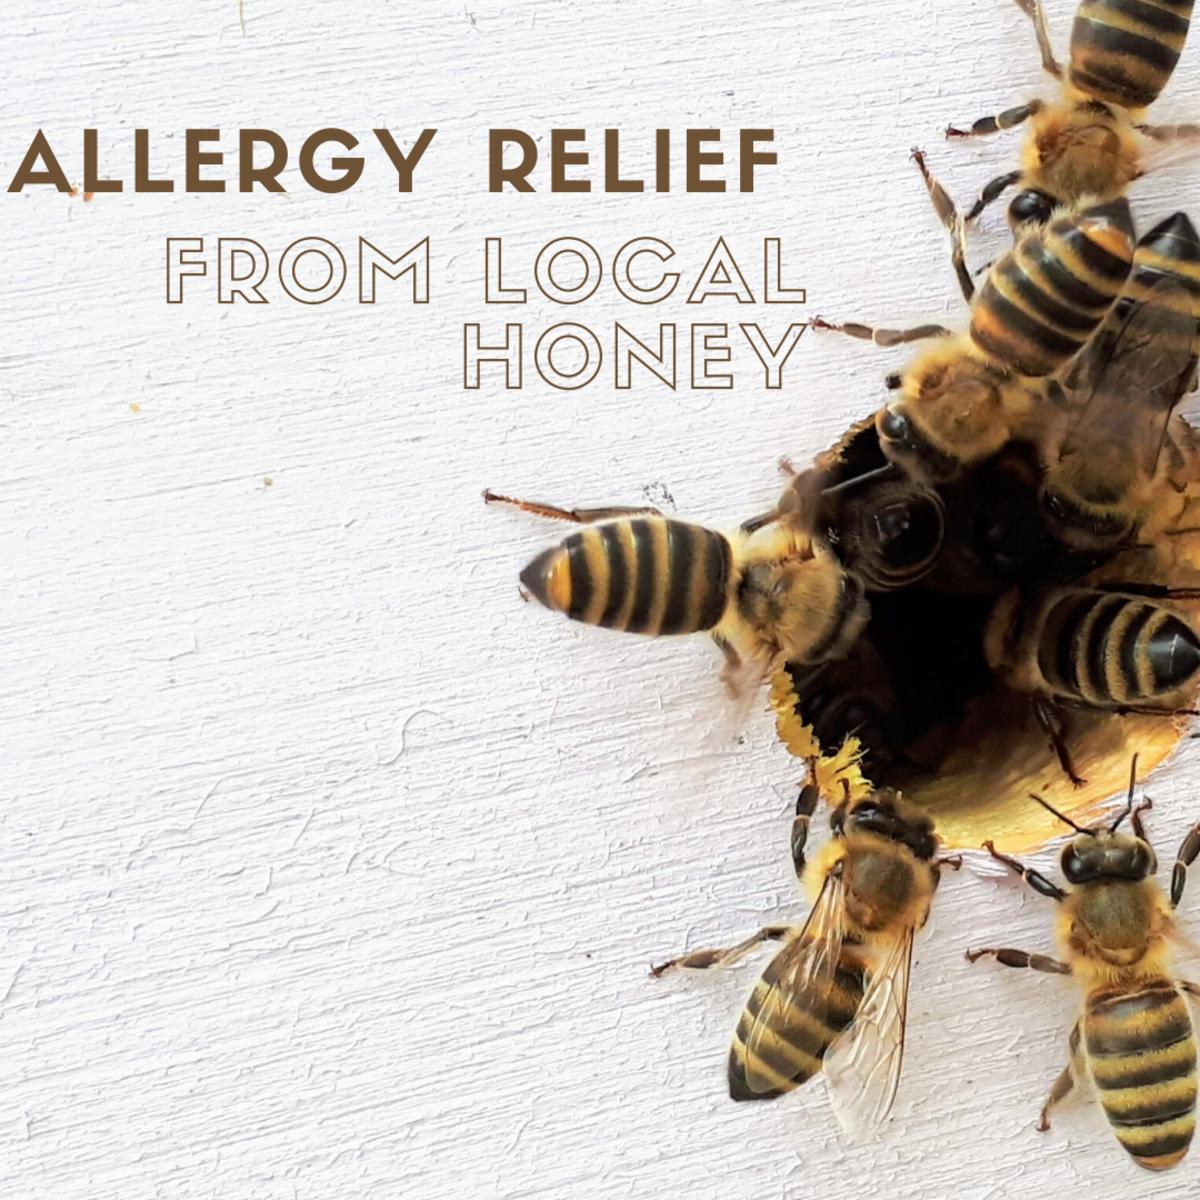 Bad allergies? Consider local honey.